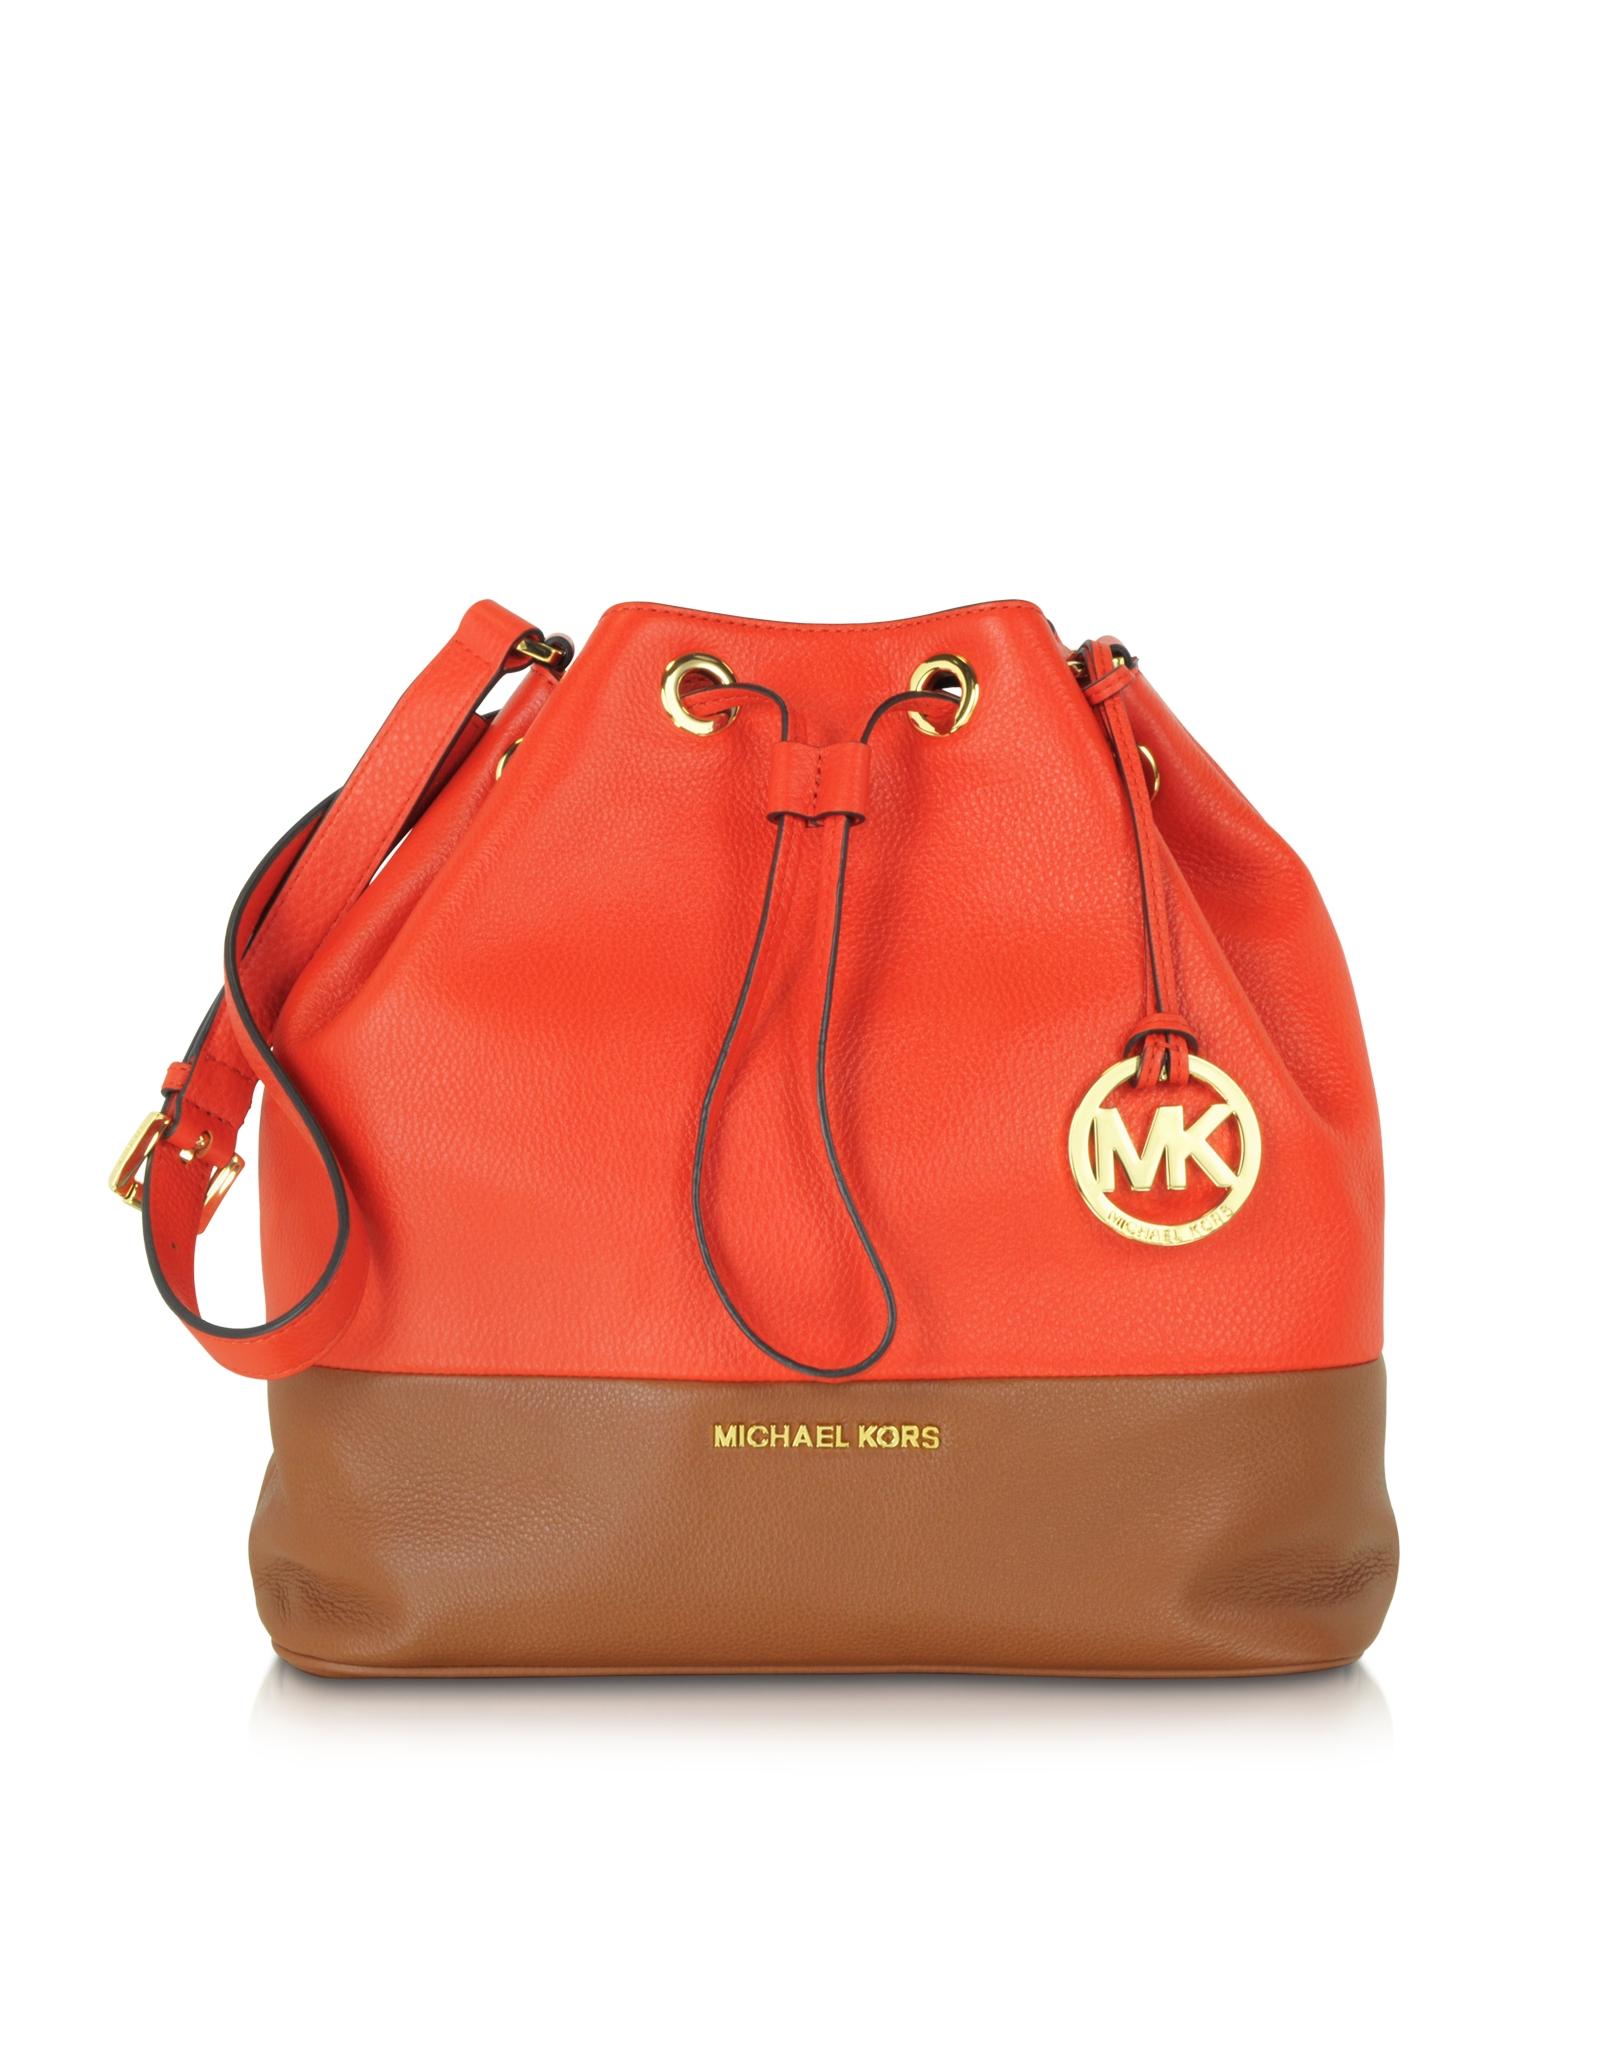 b10a3800d38b Michael Kors Jules Large Color-Block Shoulder Bag in Red - Lyst